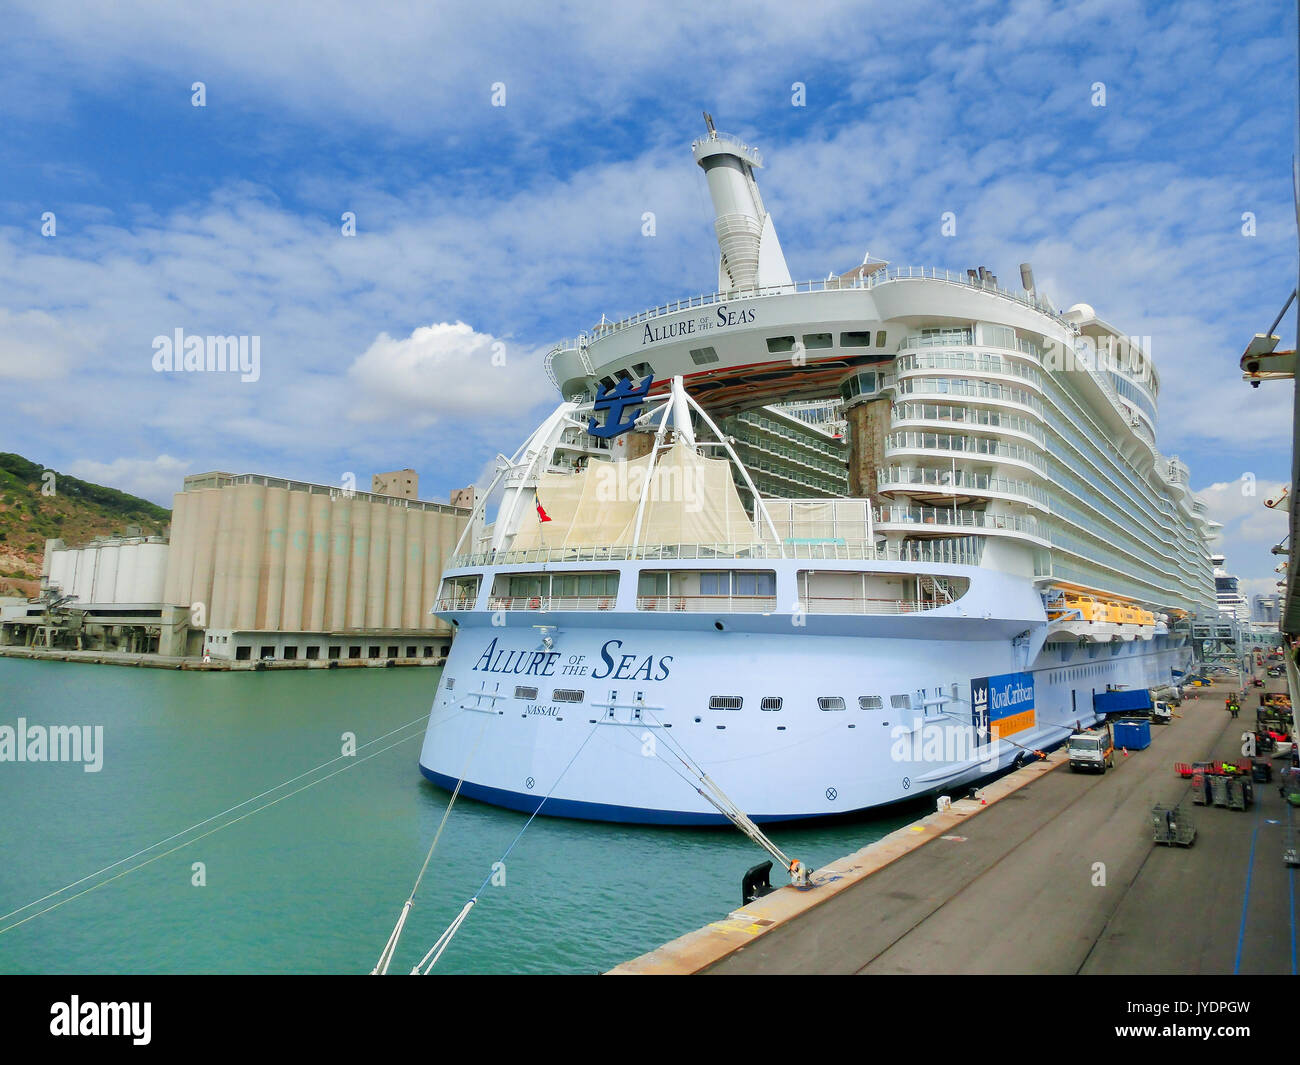 Barcelona, Spain - September 06, 2015: The cruise ship Allure of the